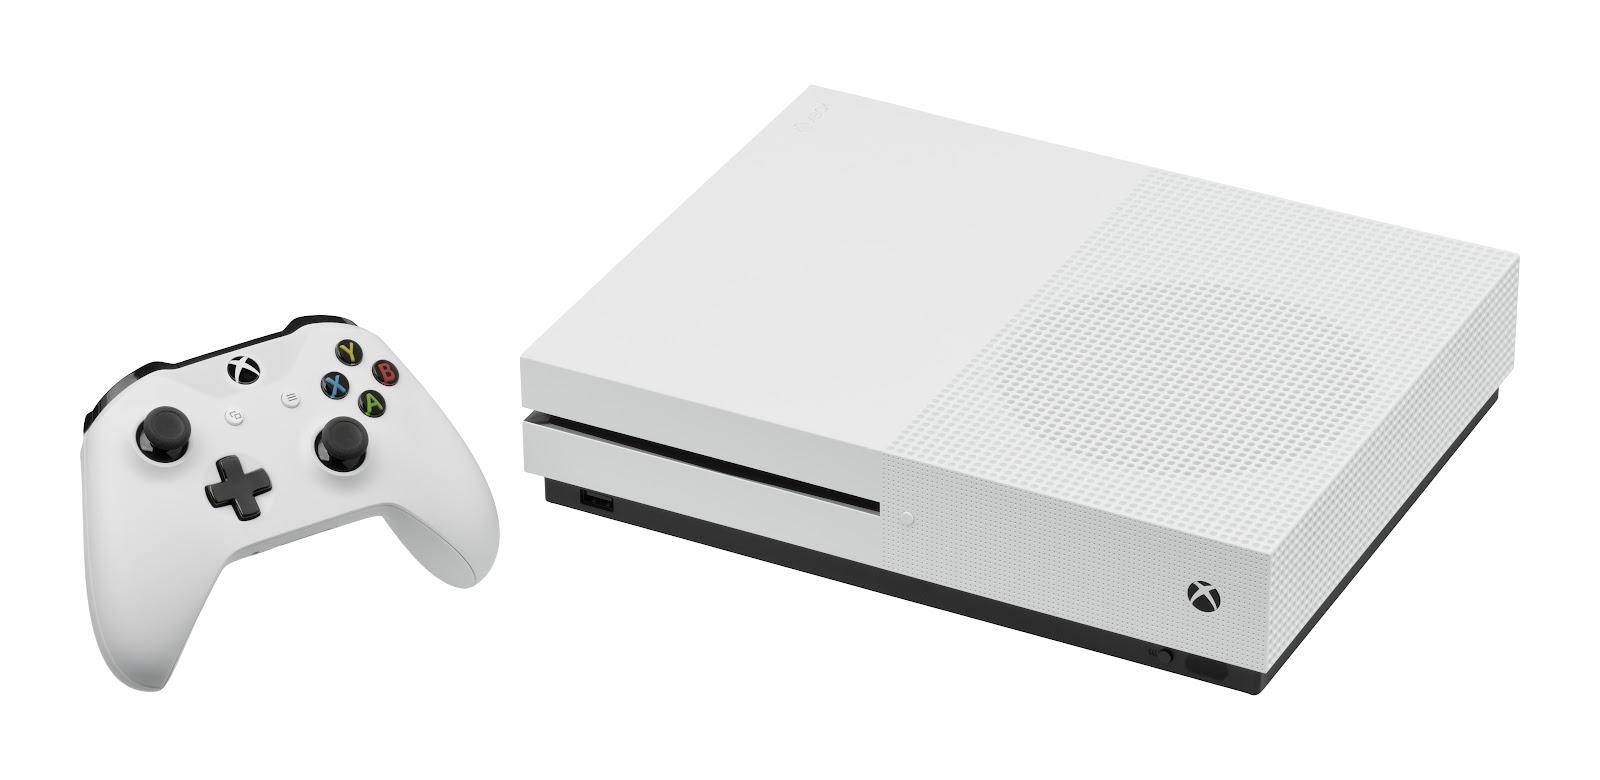 File:Microsoft-Xbox-One-S-Console-wController-L.jpg - Wikimedia ...